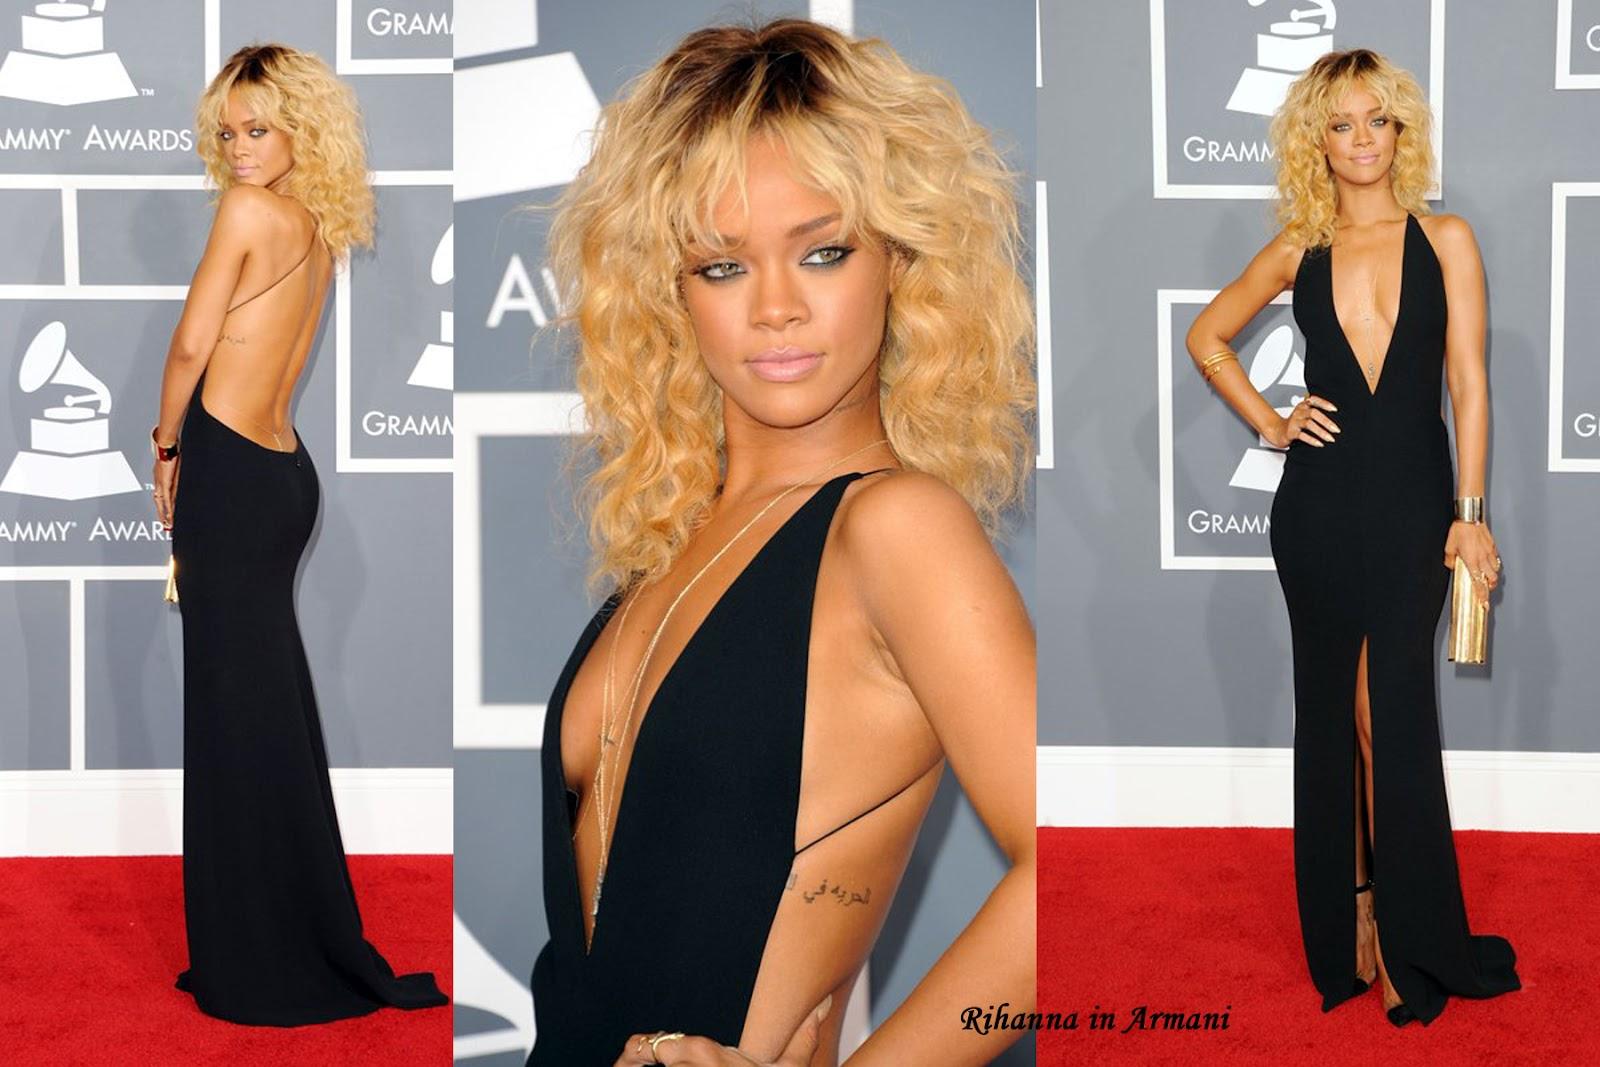 http://1.bp.blogspot.com/-uGwz9_W6oQ0/Tzh14_hcxII/AAAAAAAAEfs/AUT4i4TphRo/s1600/Rihanna+Grammy2012.jpg